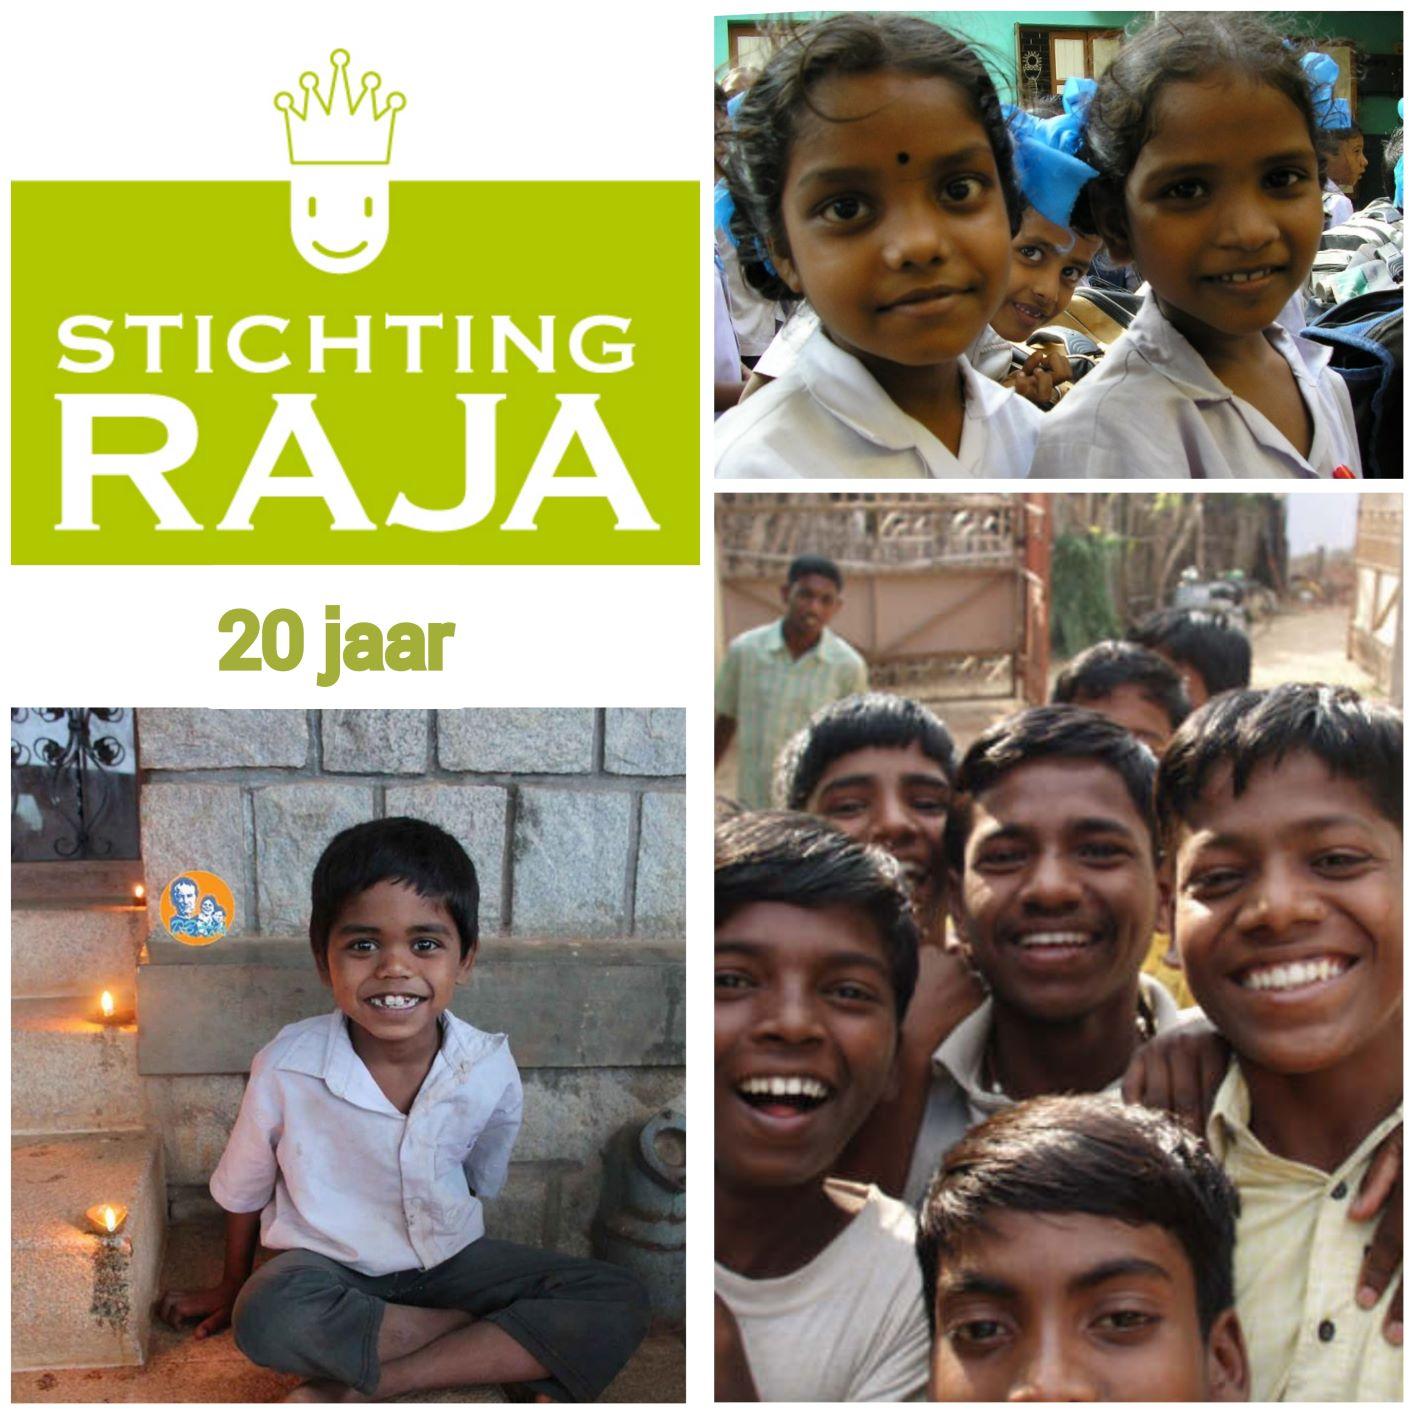 Raja 20 jaar verkleind